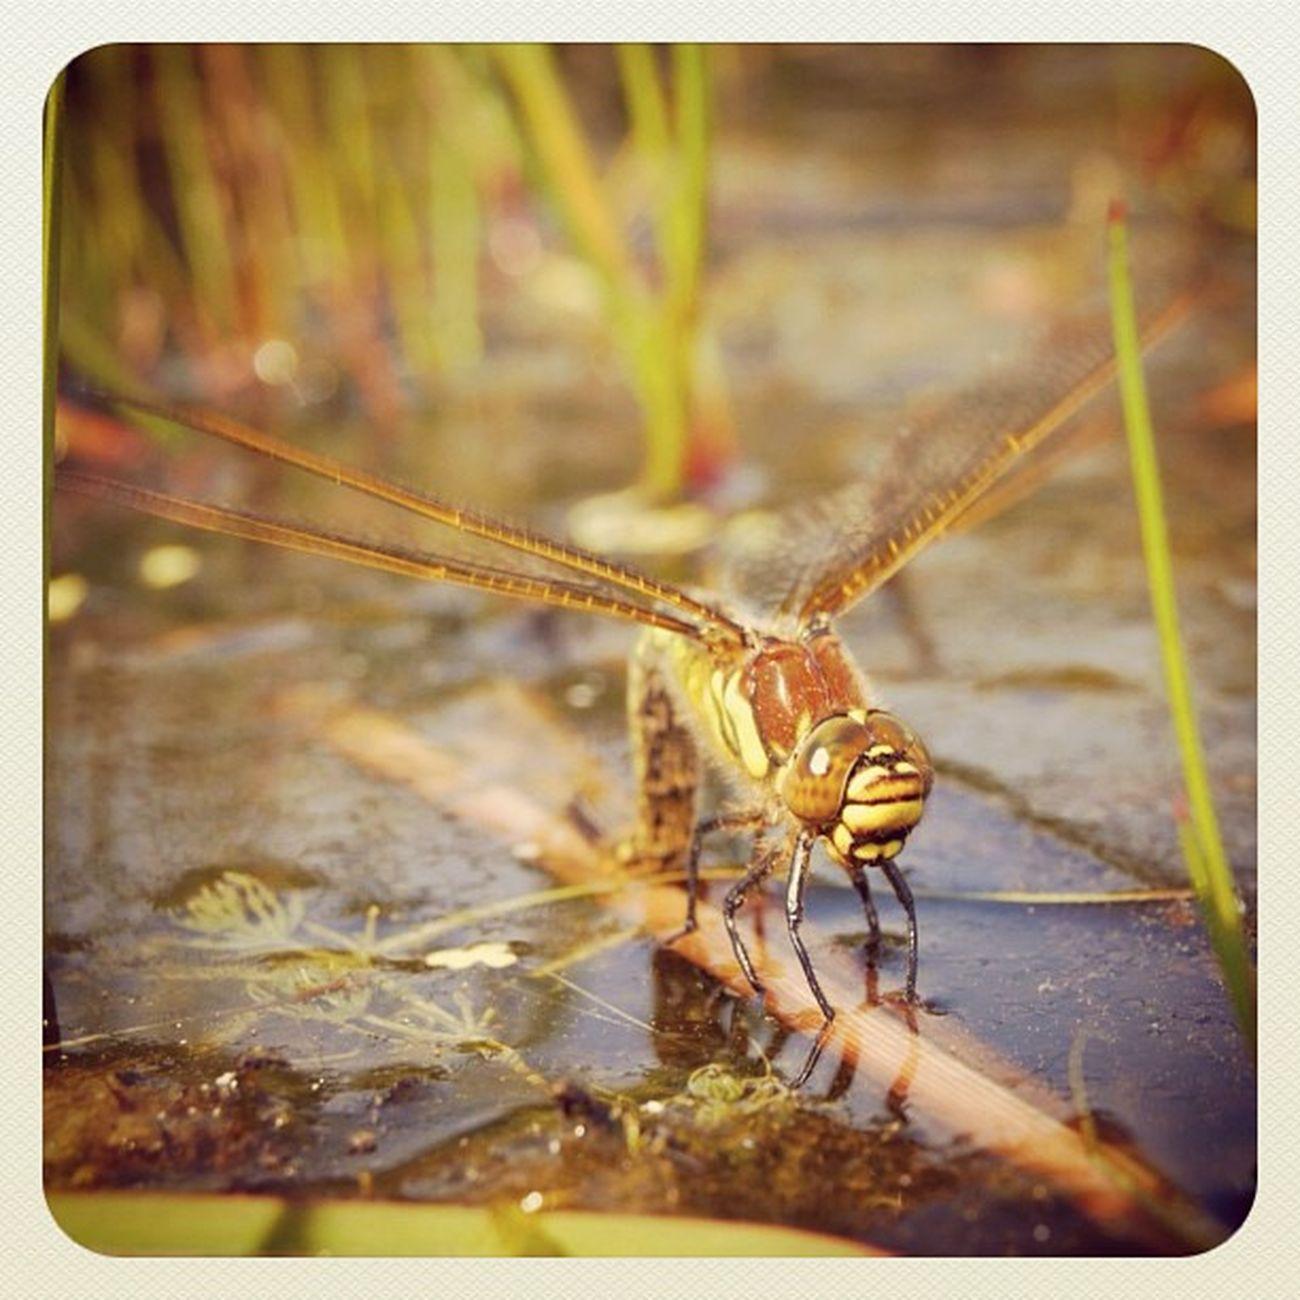 Naarden Naardermeer Libelle Dragonfly insect natuurmonumenten mooigooi ig_nature panasonic lumix